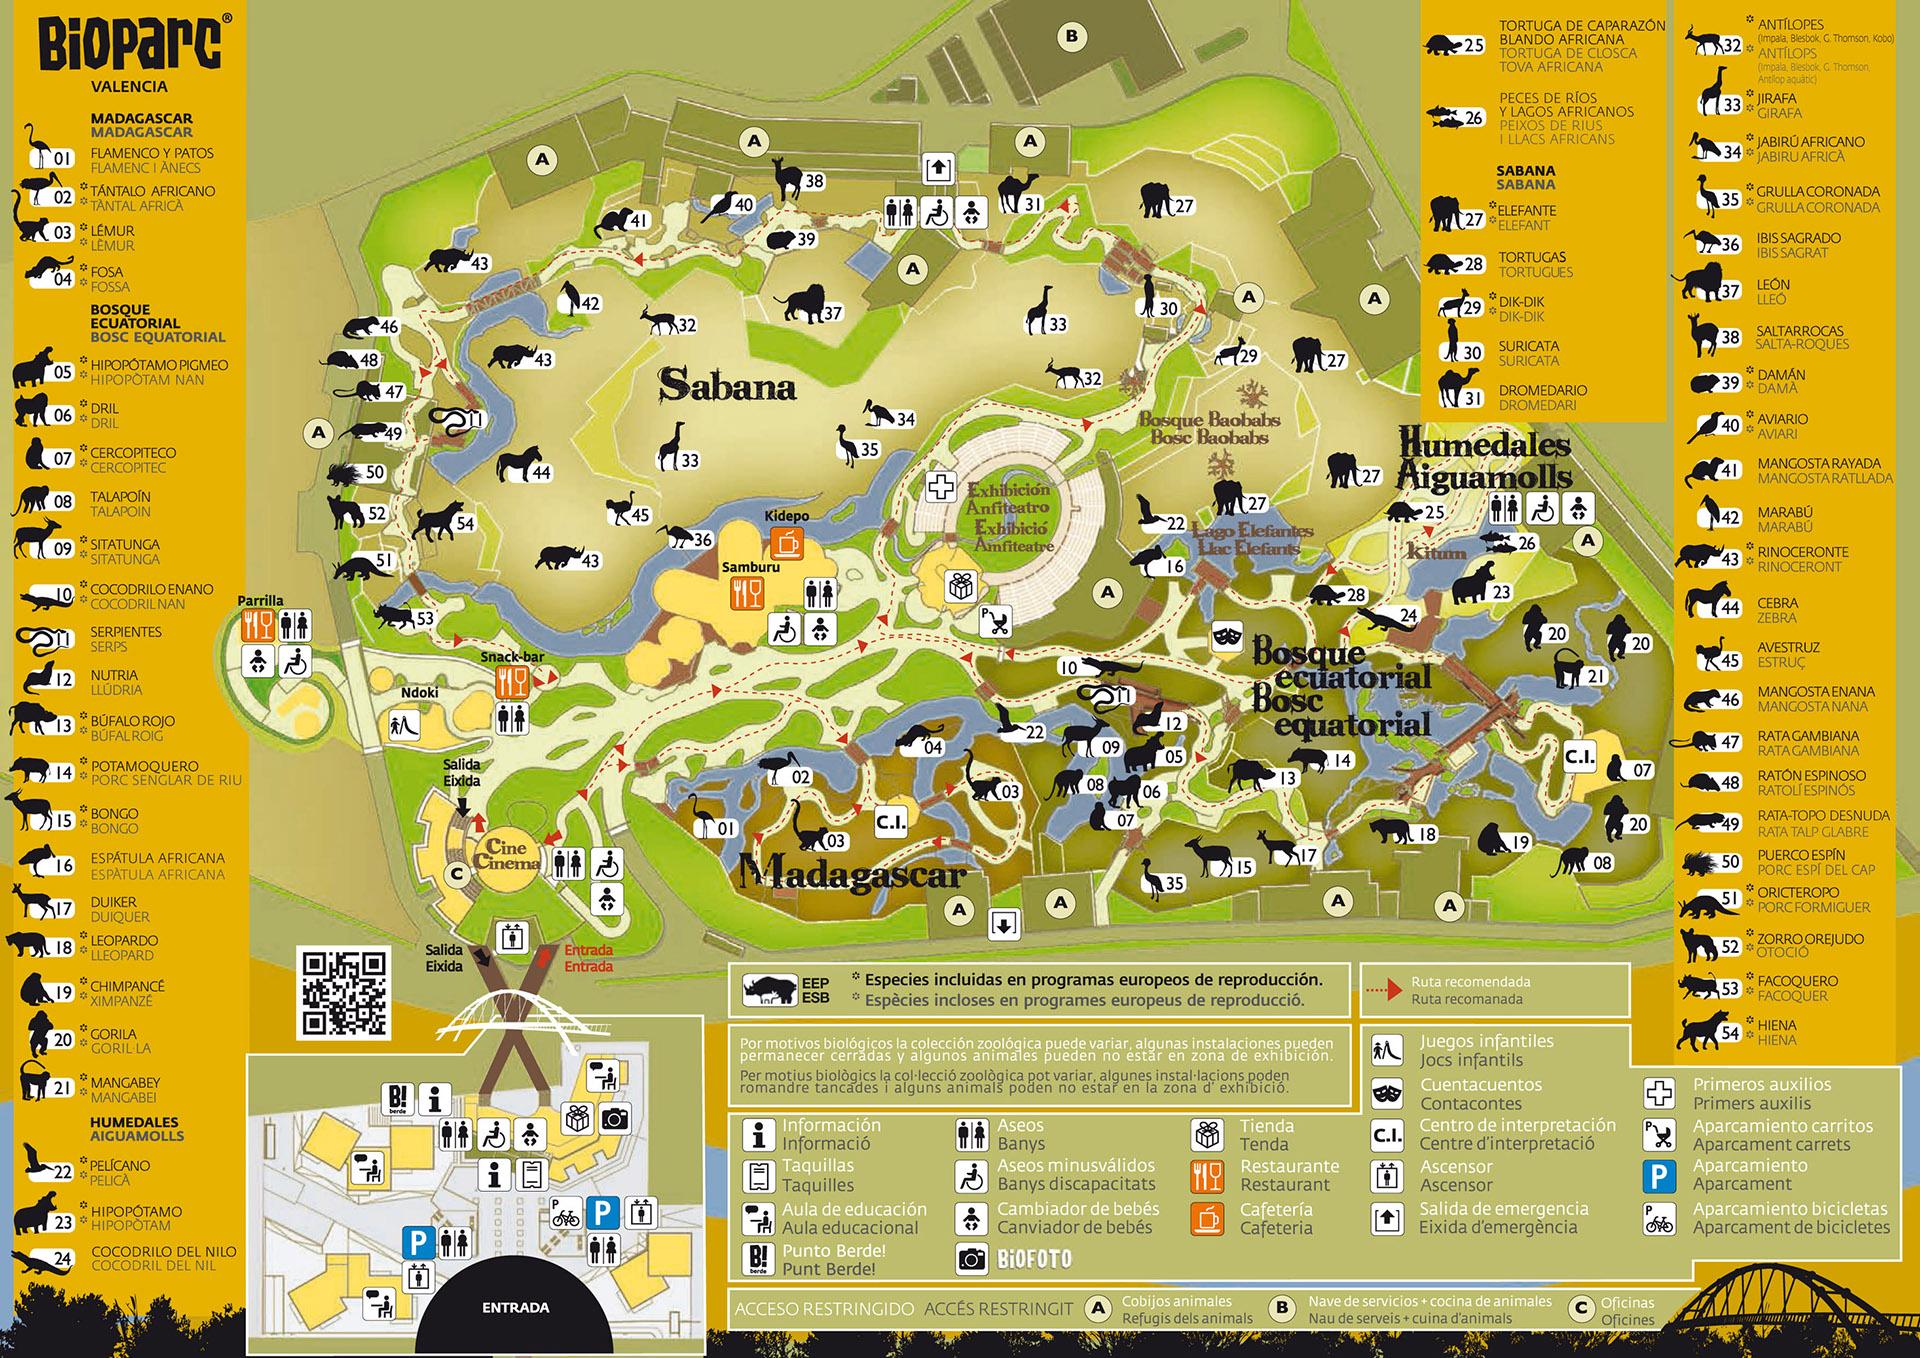 Parque zool gico natural bioparc en valencia gu a de - Bioparc precios valencia ...